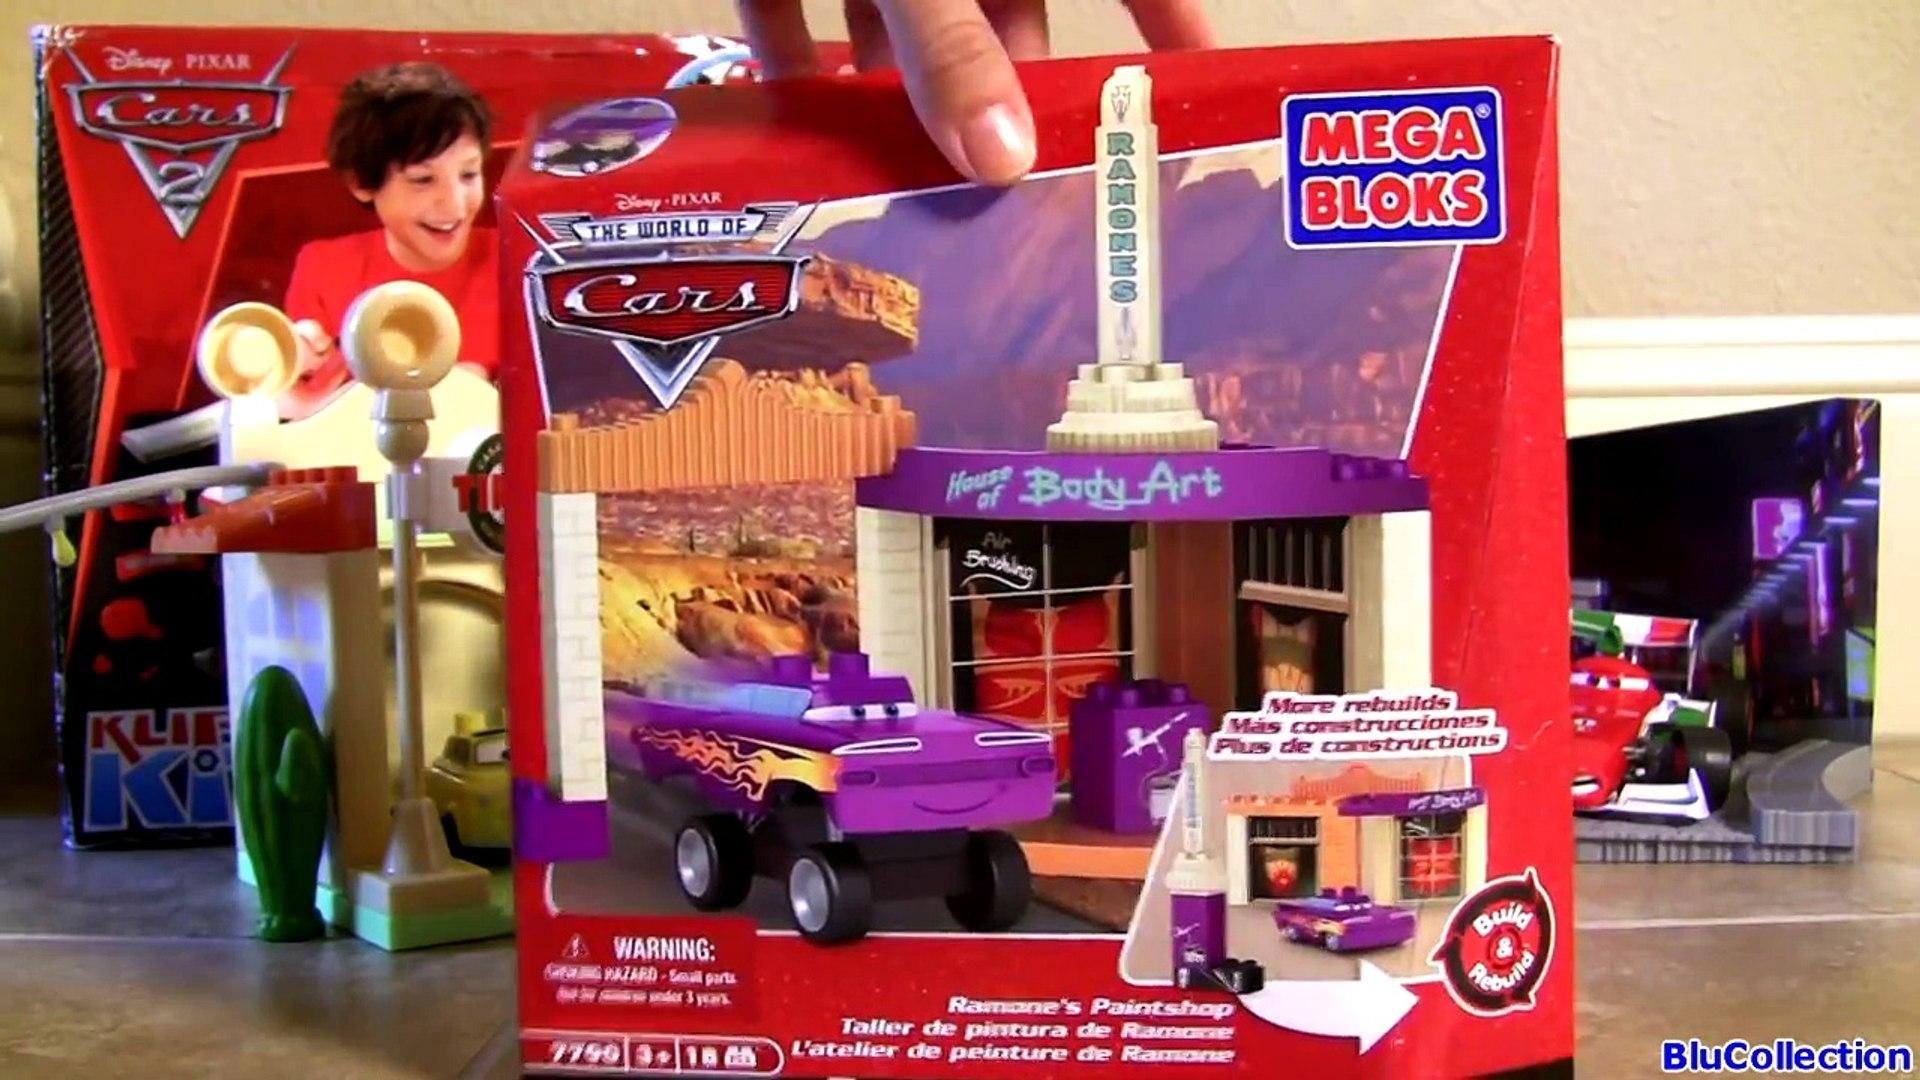 Mega Bloks Cars Ramones Paintshop Body Art 7790 Building Toys Disney Pixar By Toy Collector Video Dailymotion